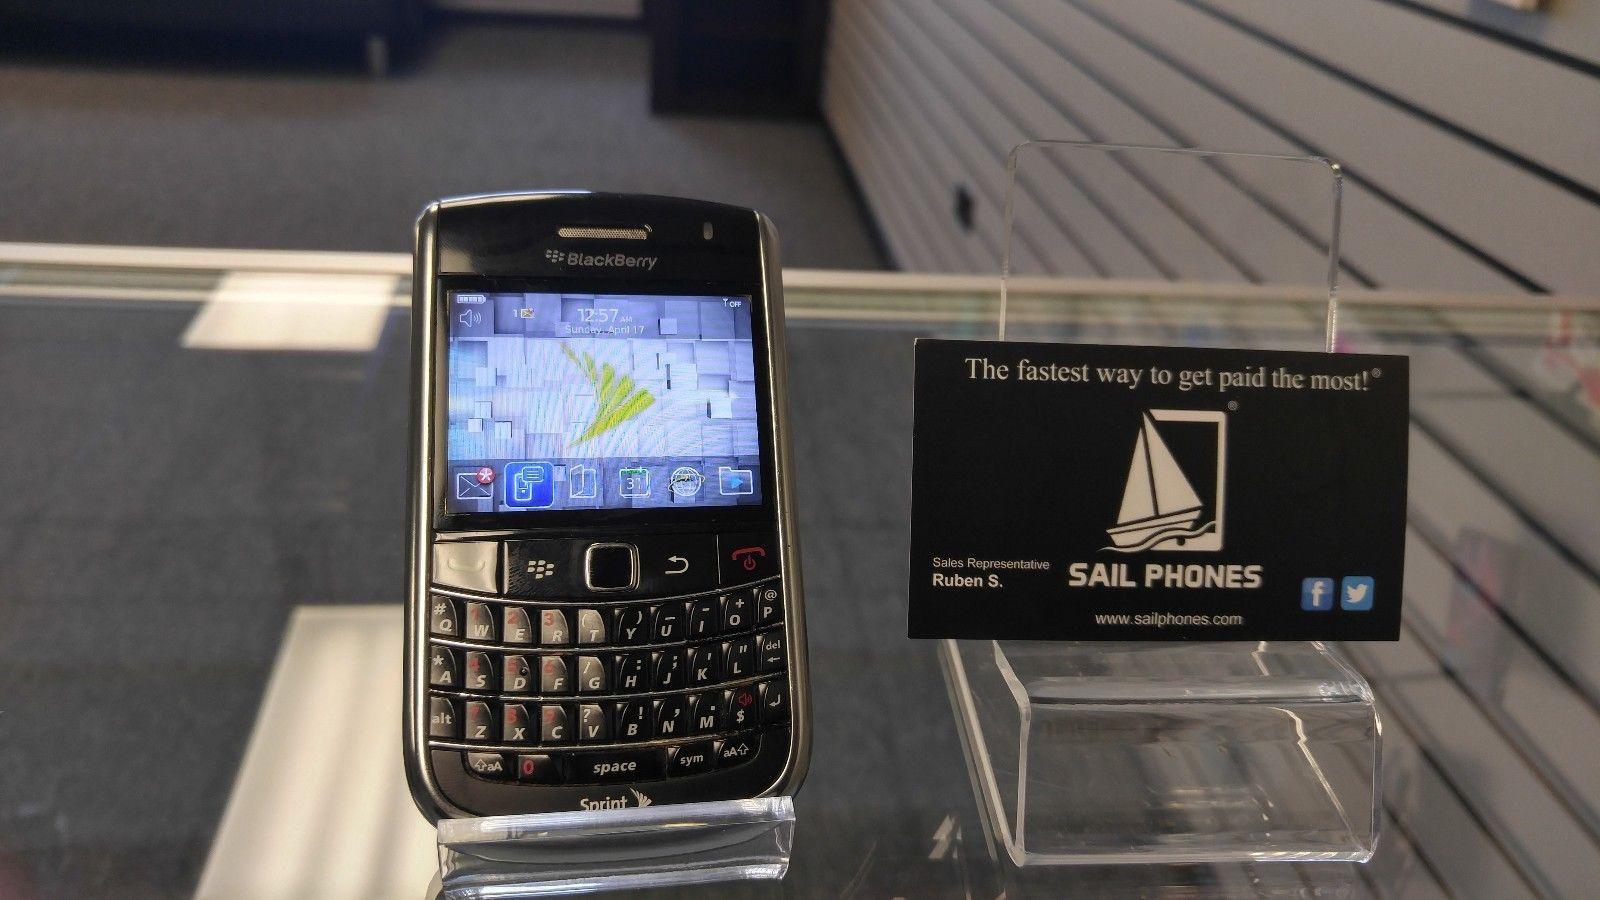 BlackBerry Bold 9650 - Black (Sprint) Smartphone (SBBRI9650BKXXHW) https://t.co/yiUQm4IvtC https://t.co/yVybQyLLxJ